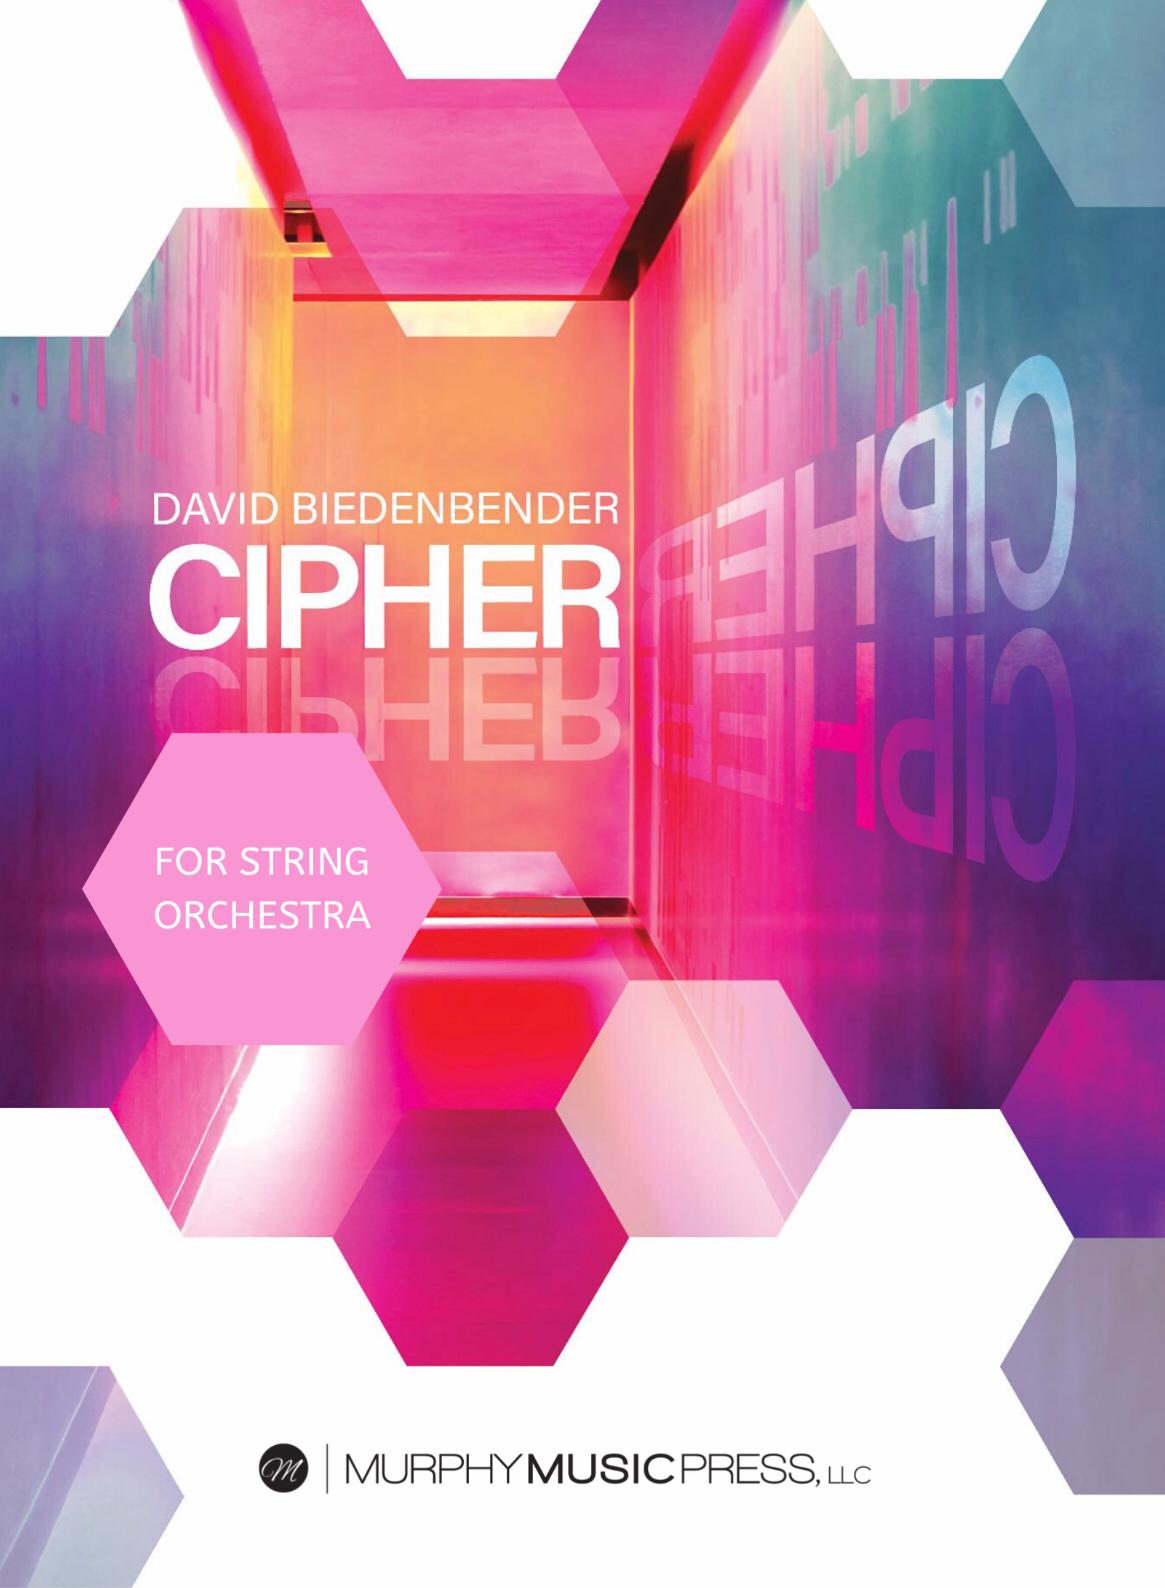 Cipher (Score Only, String Orchestra Version) by David Biedenbender